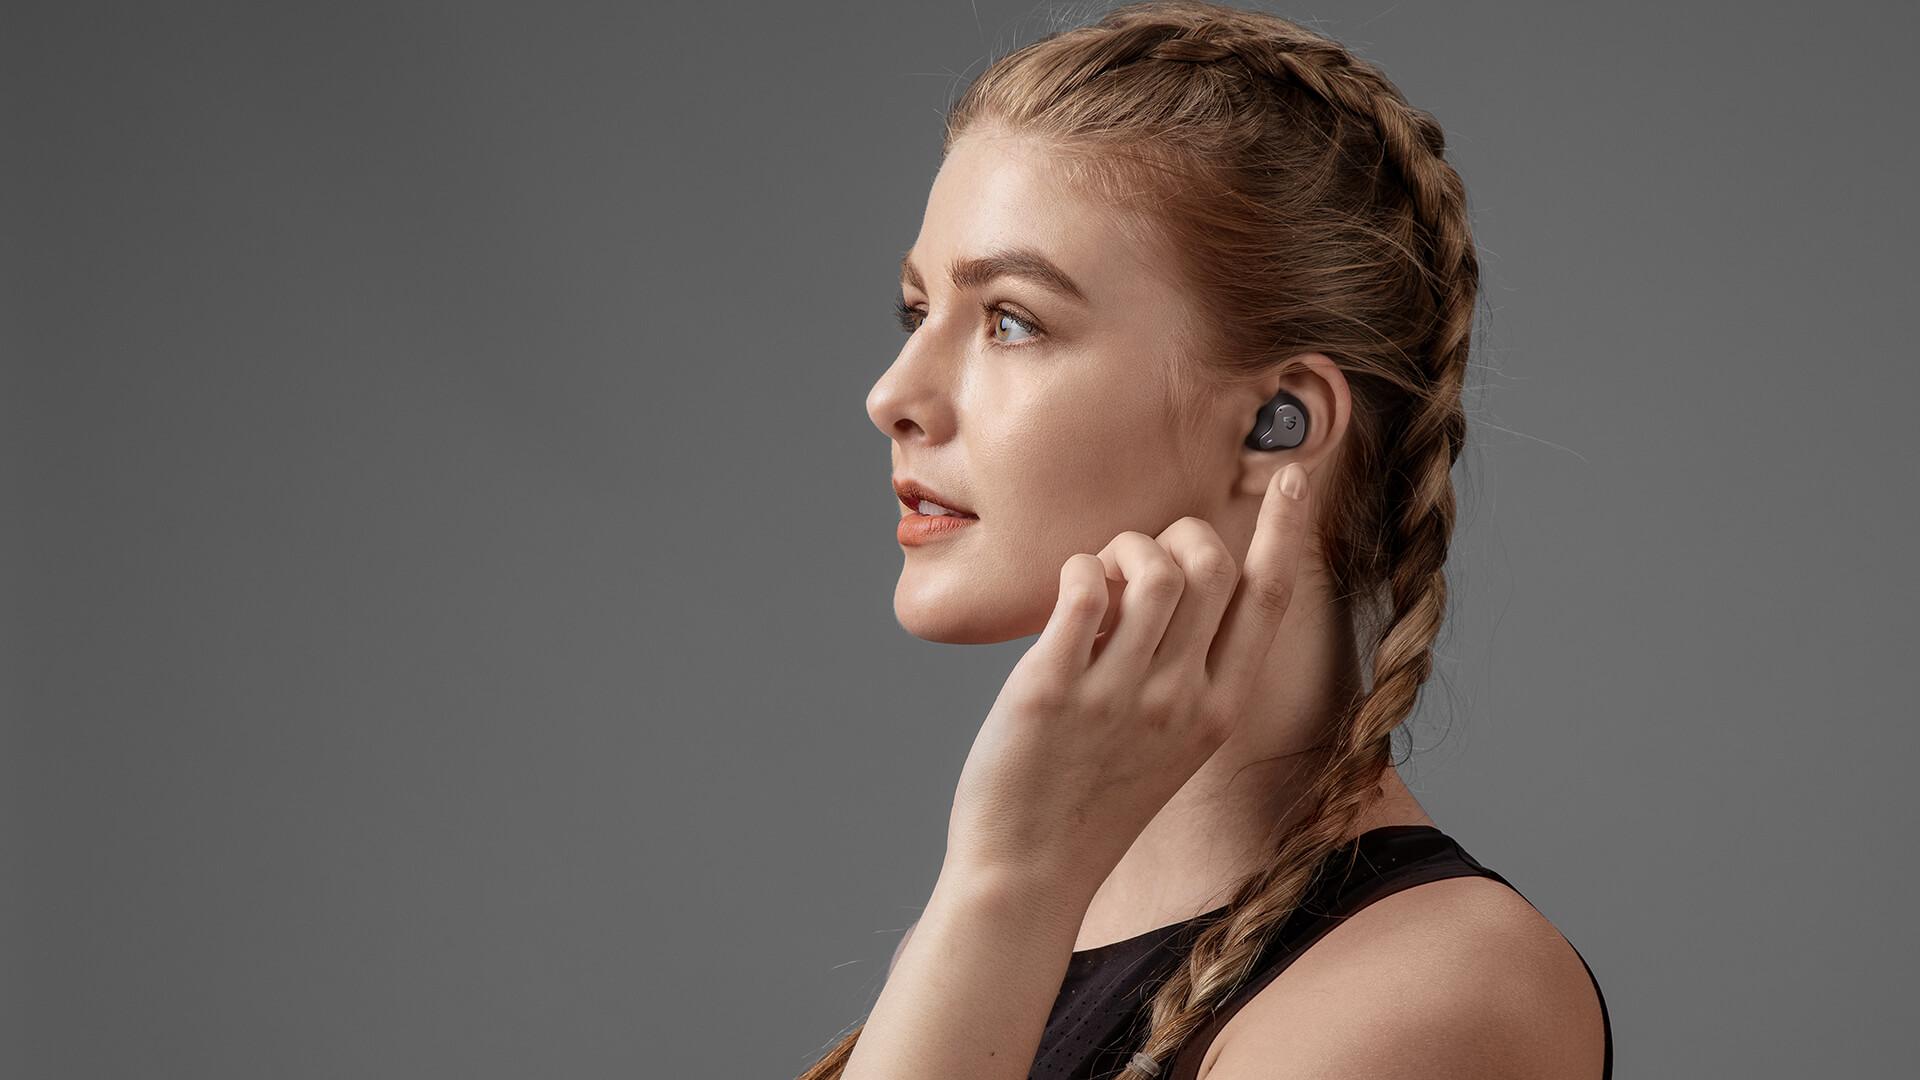 Customer Reviews of SOUNDPEATS H1